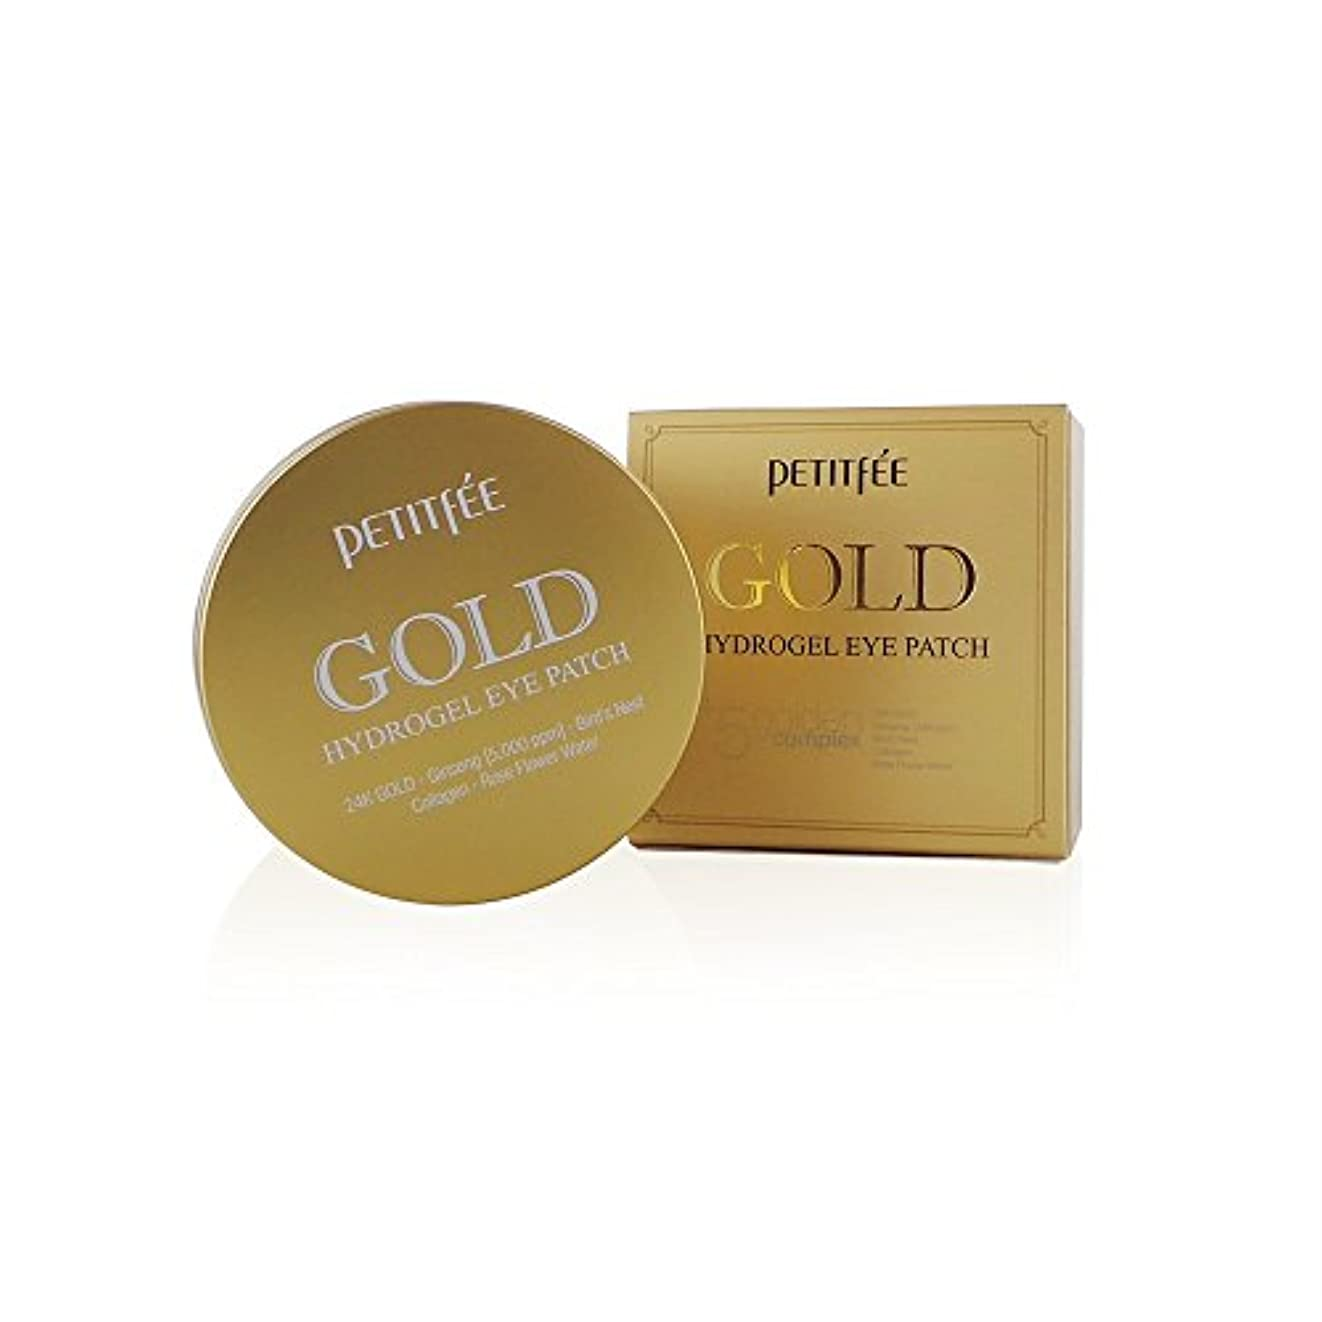 勝つ旋回側面(3 Pack) PETITFEE Gold Hydrogel Eye Patch (並行輸入品)